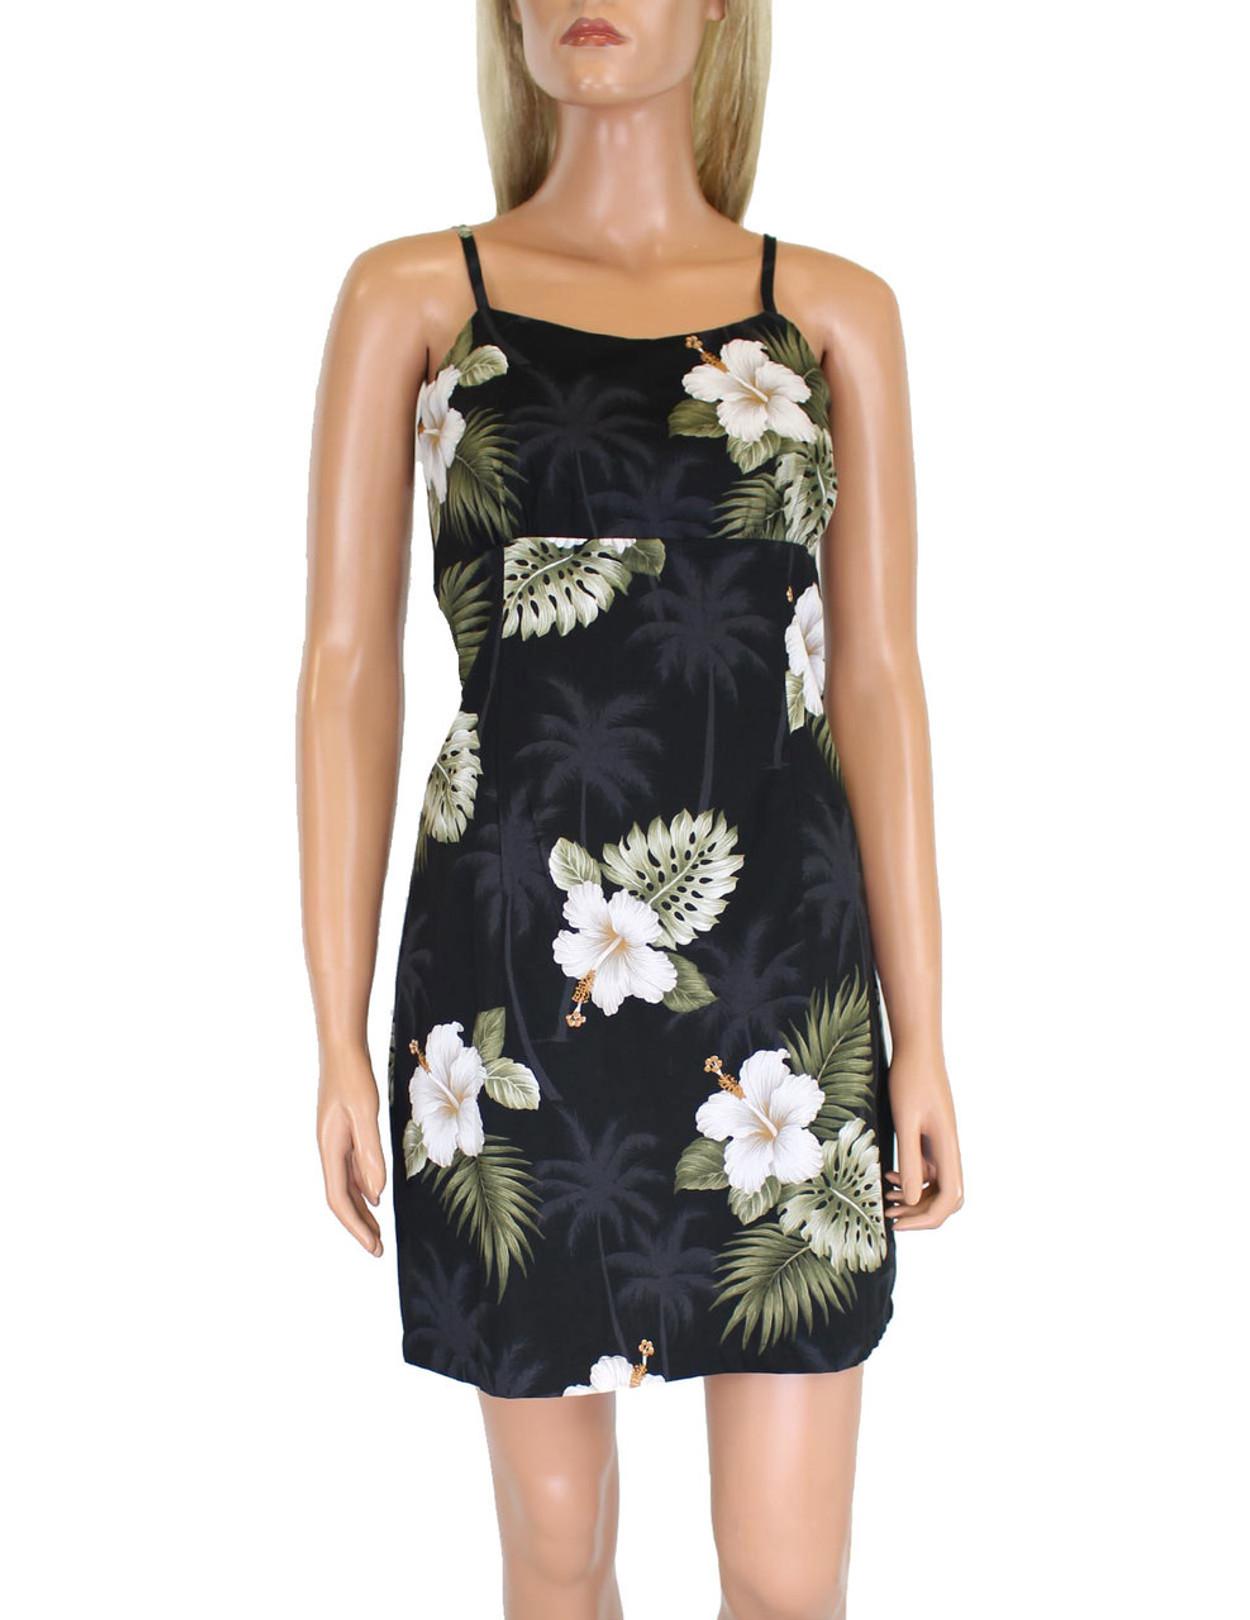 d530eb268f973 Ka Pua Short Spaghetti Beach Aloha Dress 100% Cotton Fabric Adjustable  Straps and Back Zipper